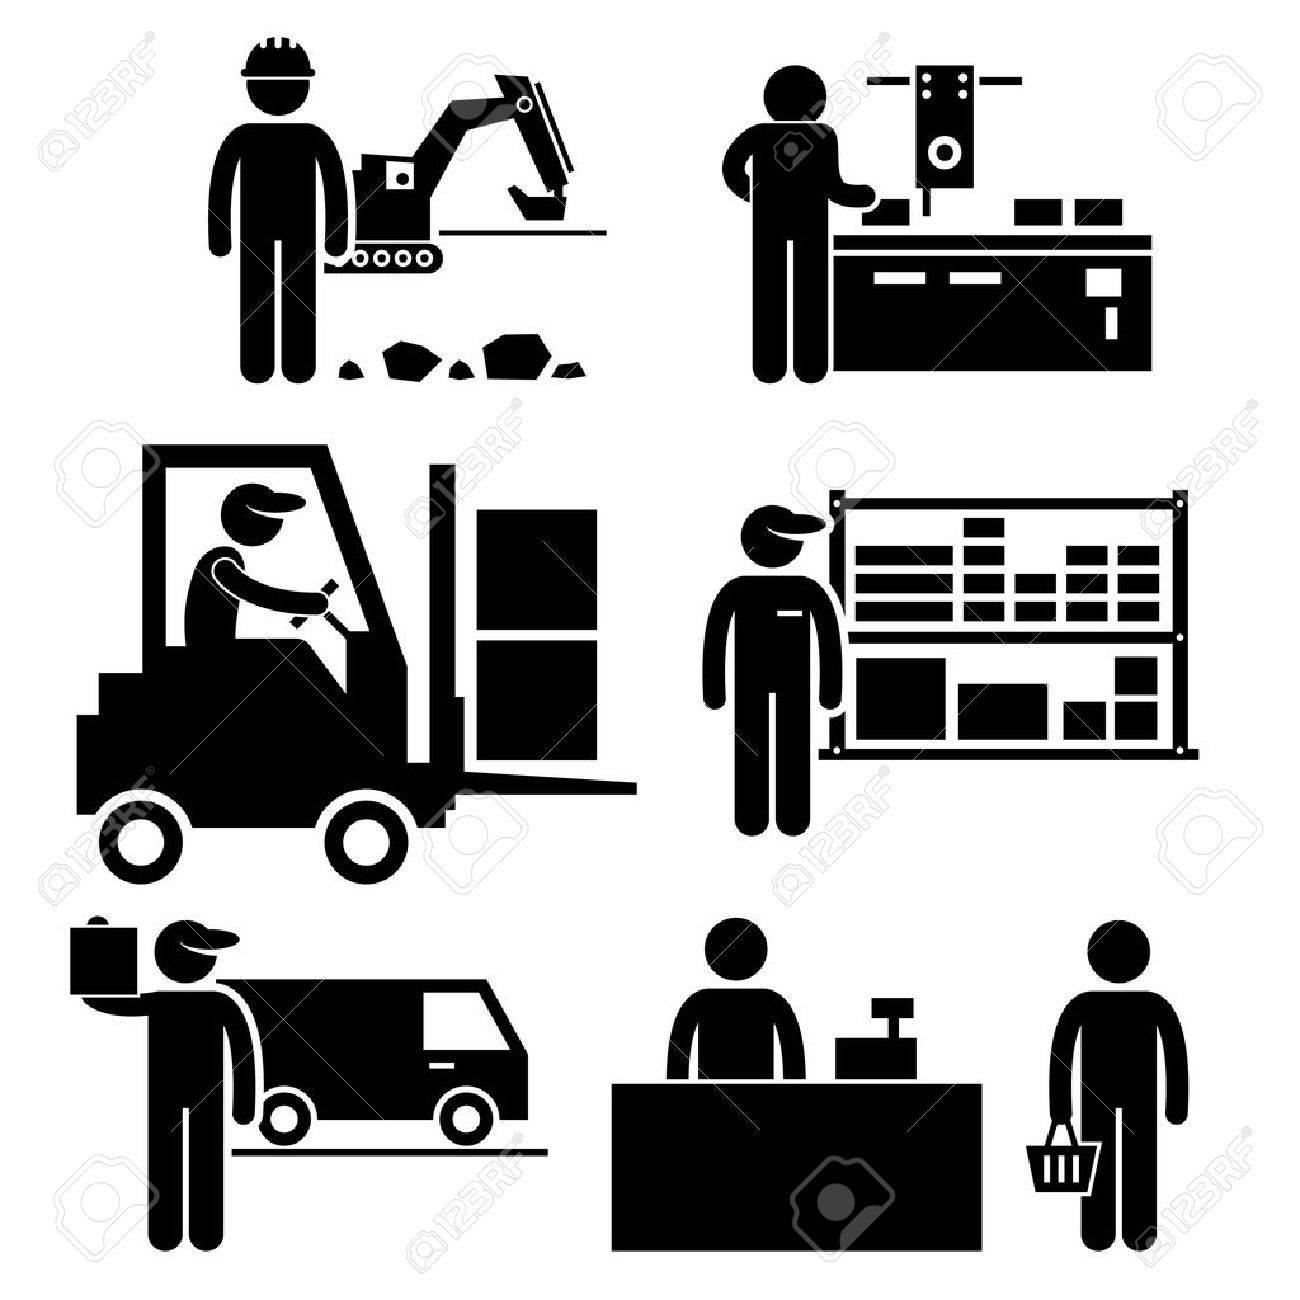 Business Ecosystem between Manufacturer, Distributor, Wholesaler, Retailer, and Consumer Stick Figure Pictogram Icon Stock Vector - 24911382